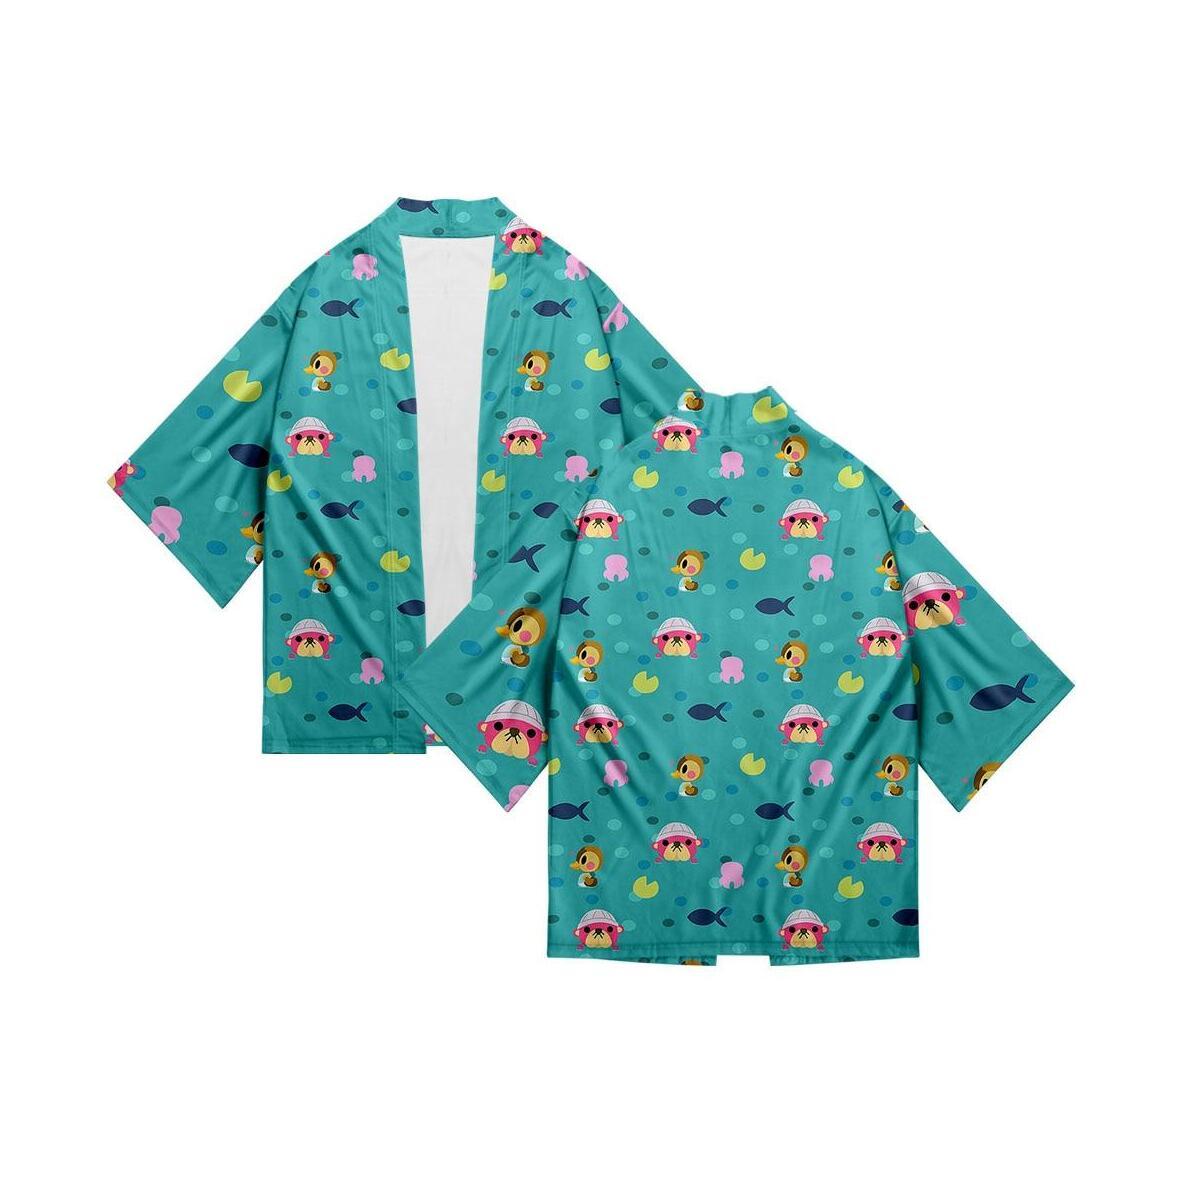 Animal Crossing Japanese Kimono Traditional Yukata Women Girls Casual Shirt Clothes Traditional Kimonos Men Boys Beach Coat, 3d 6 / 4XL